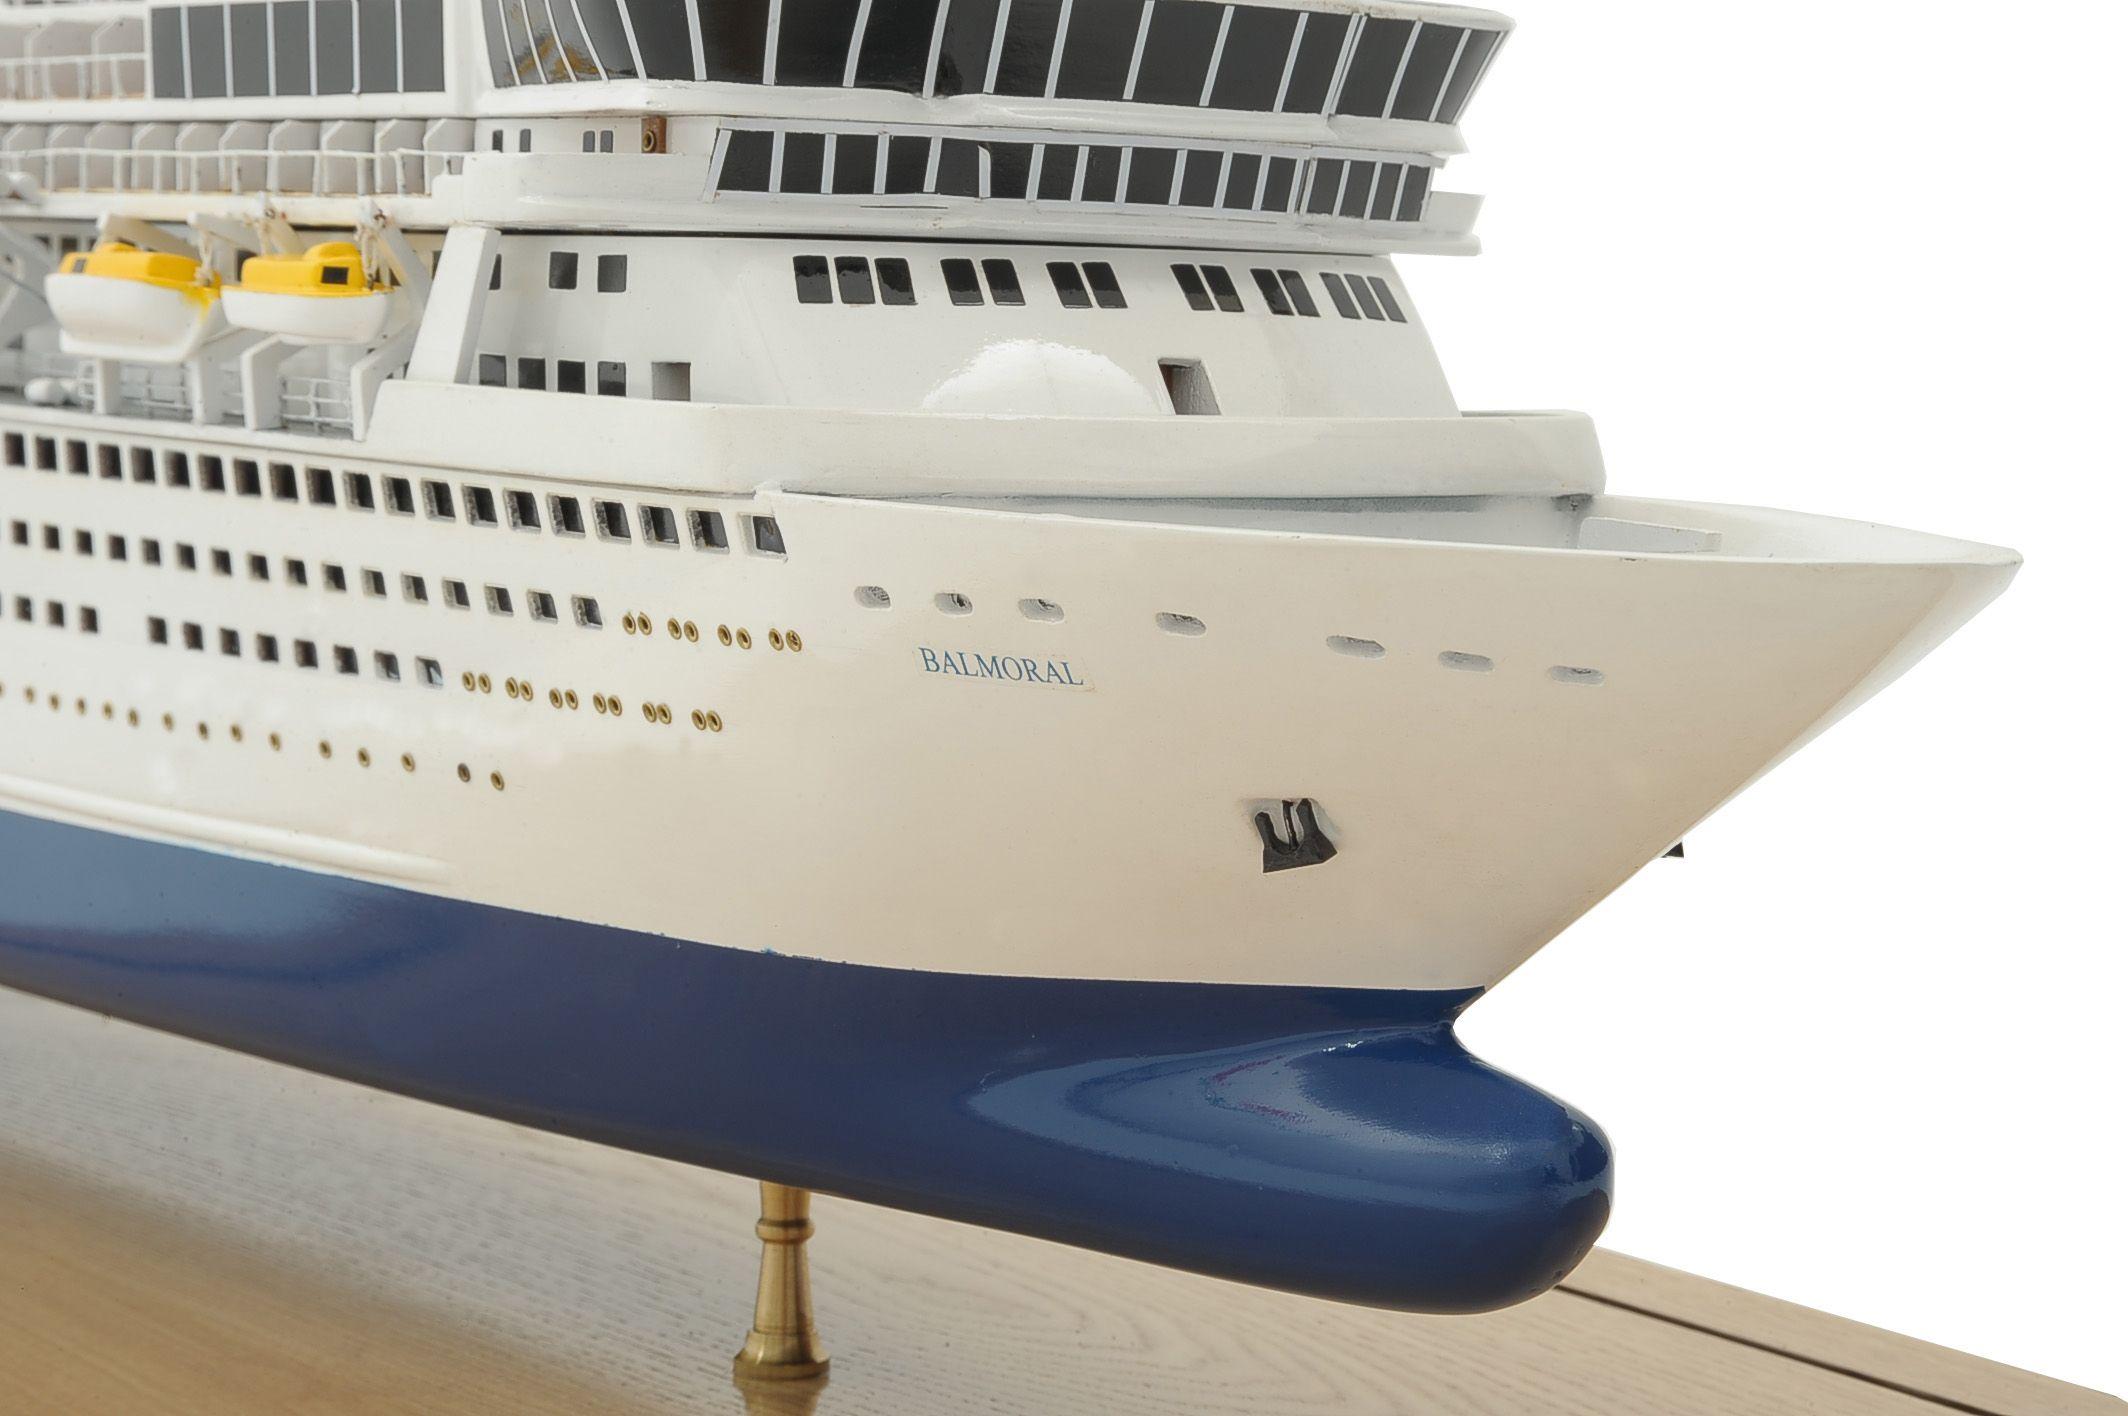 1292-6427-Balmoral-Cruise-Liner